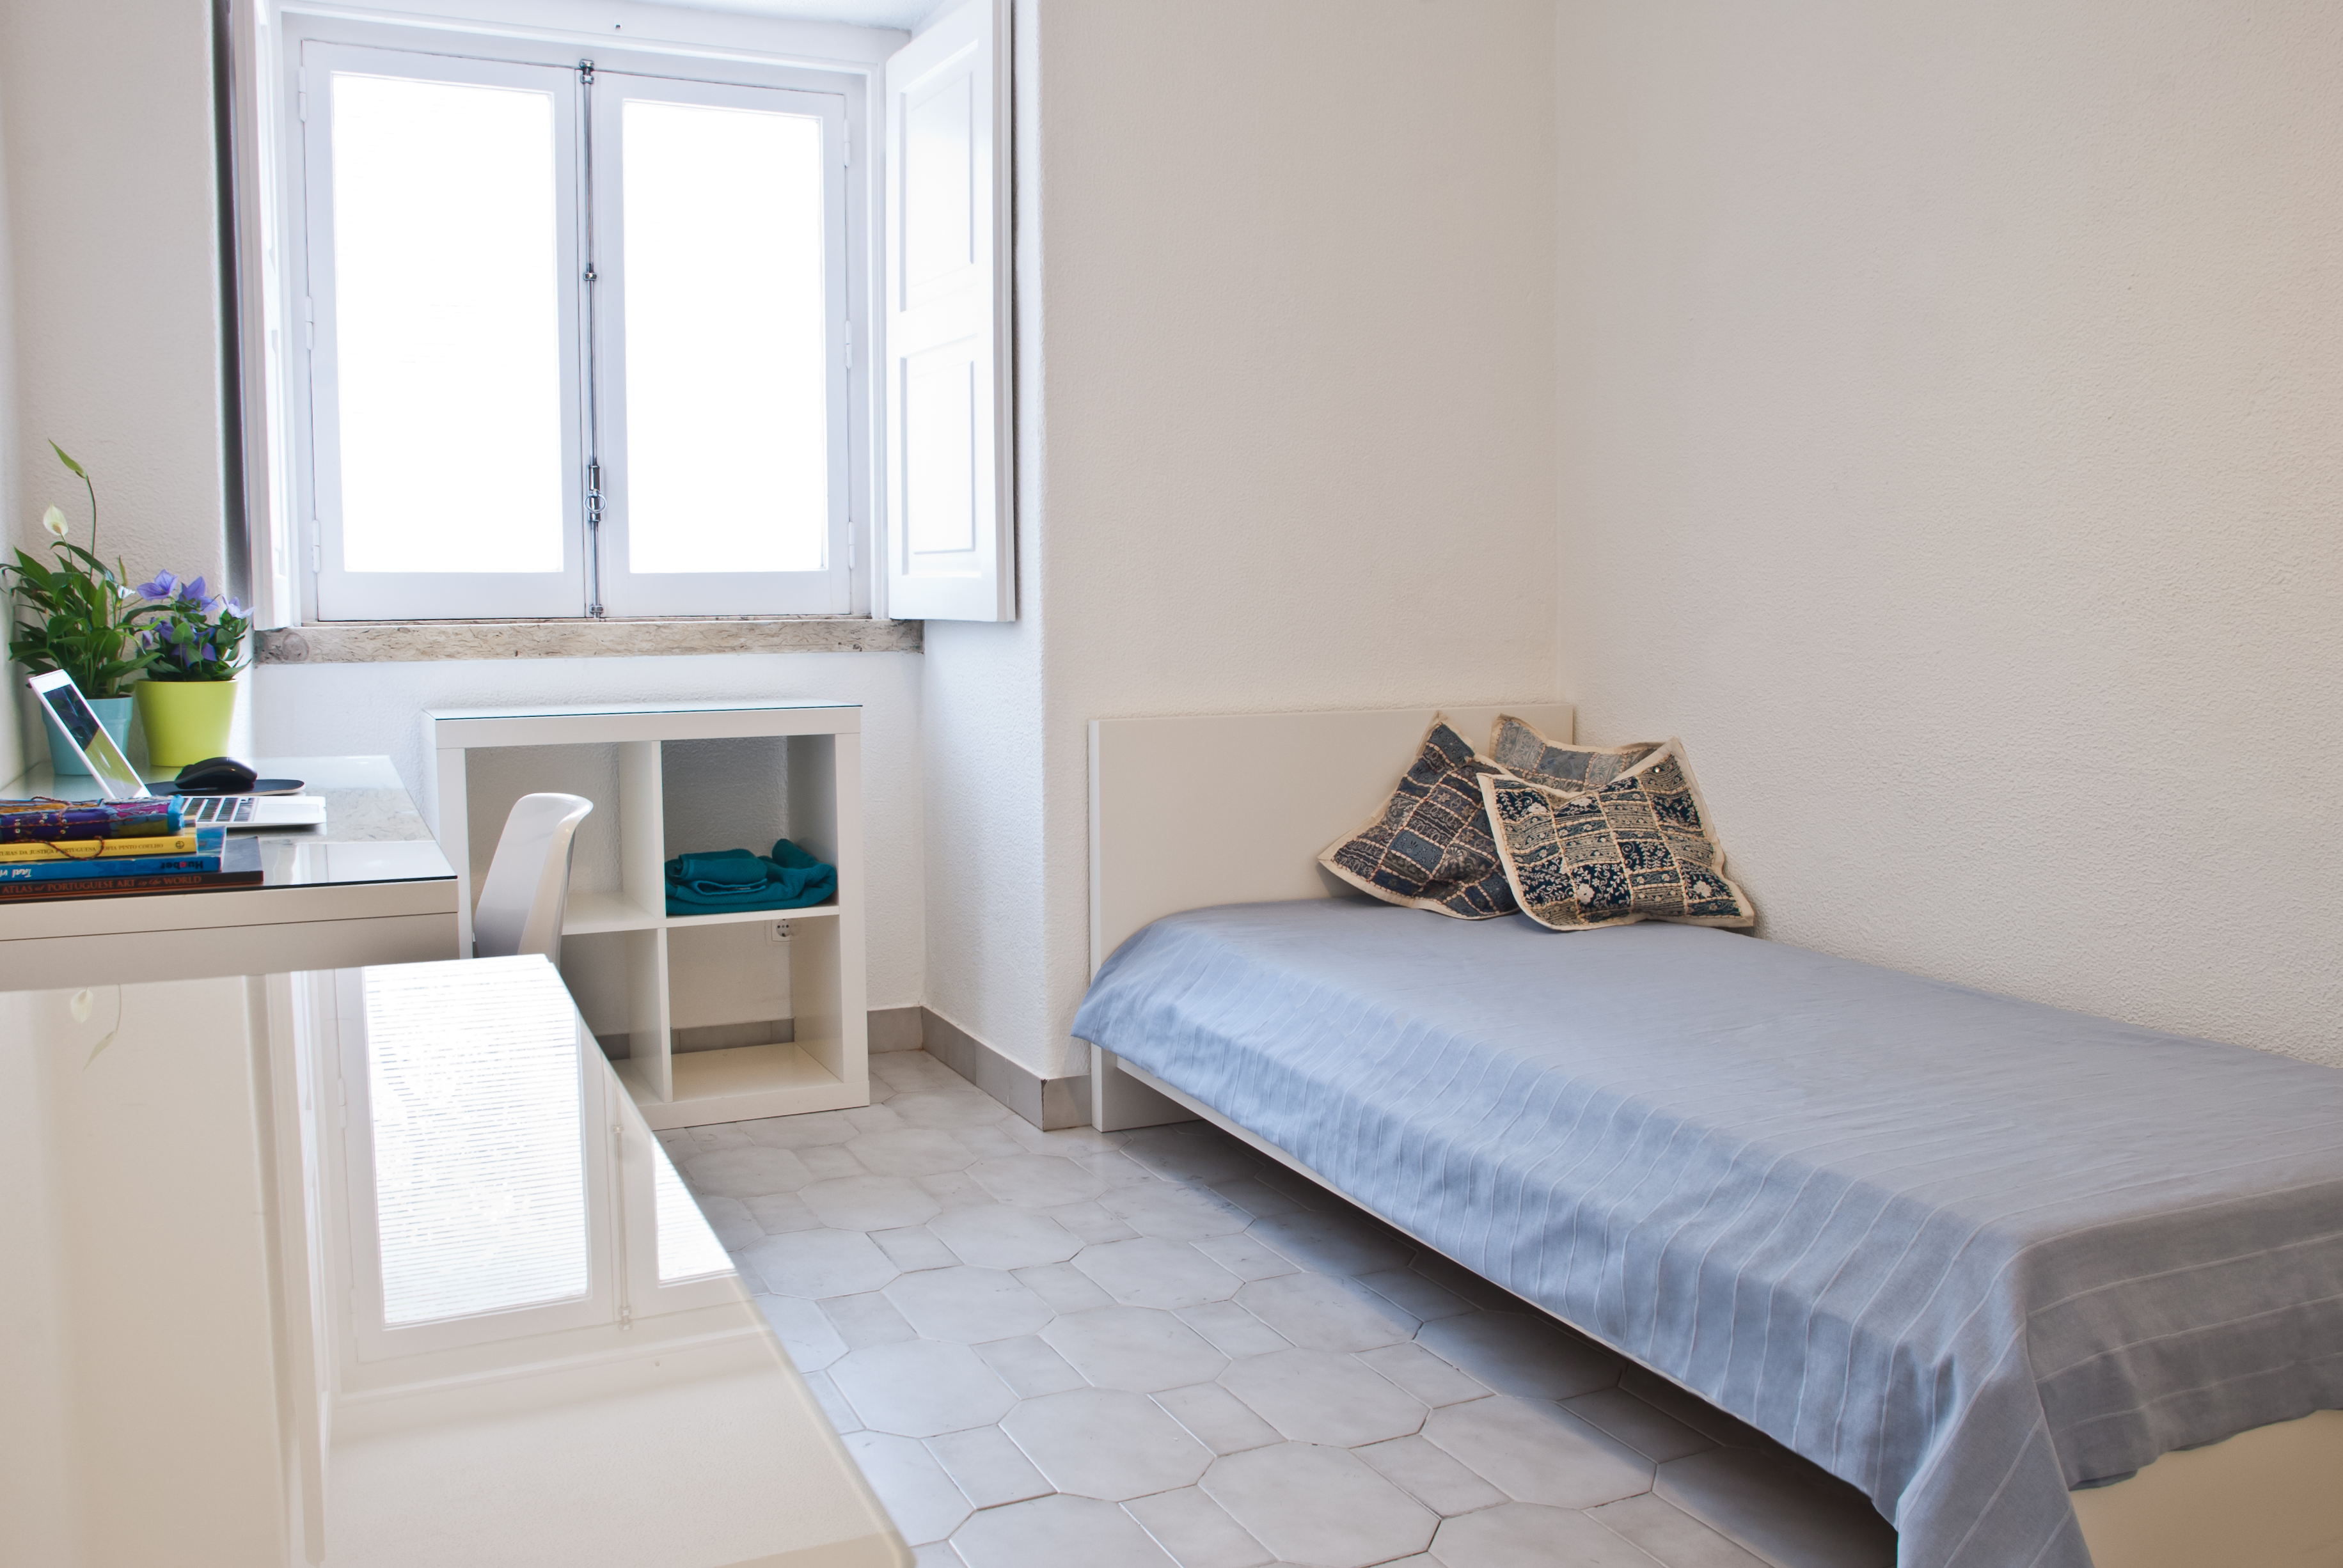 GJ_-_Quarto.Room_nº1_-_Foto_3.jpg